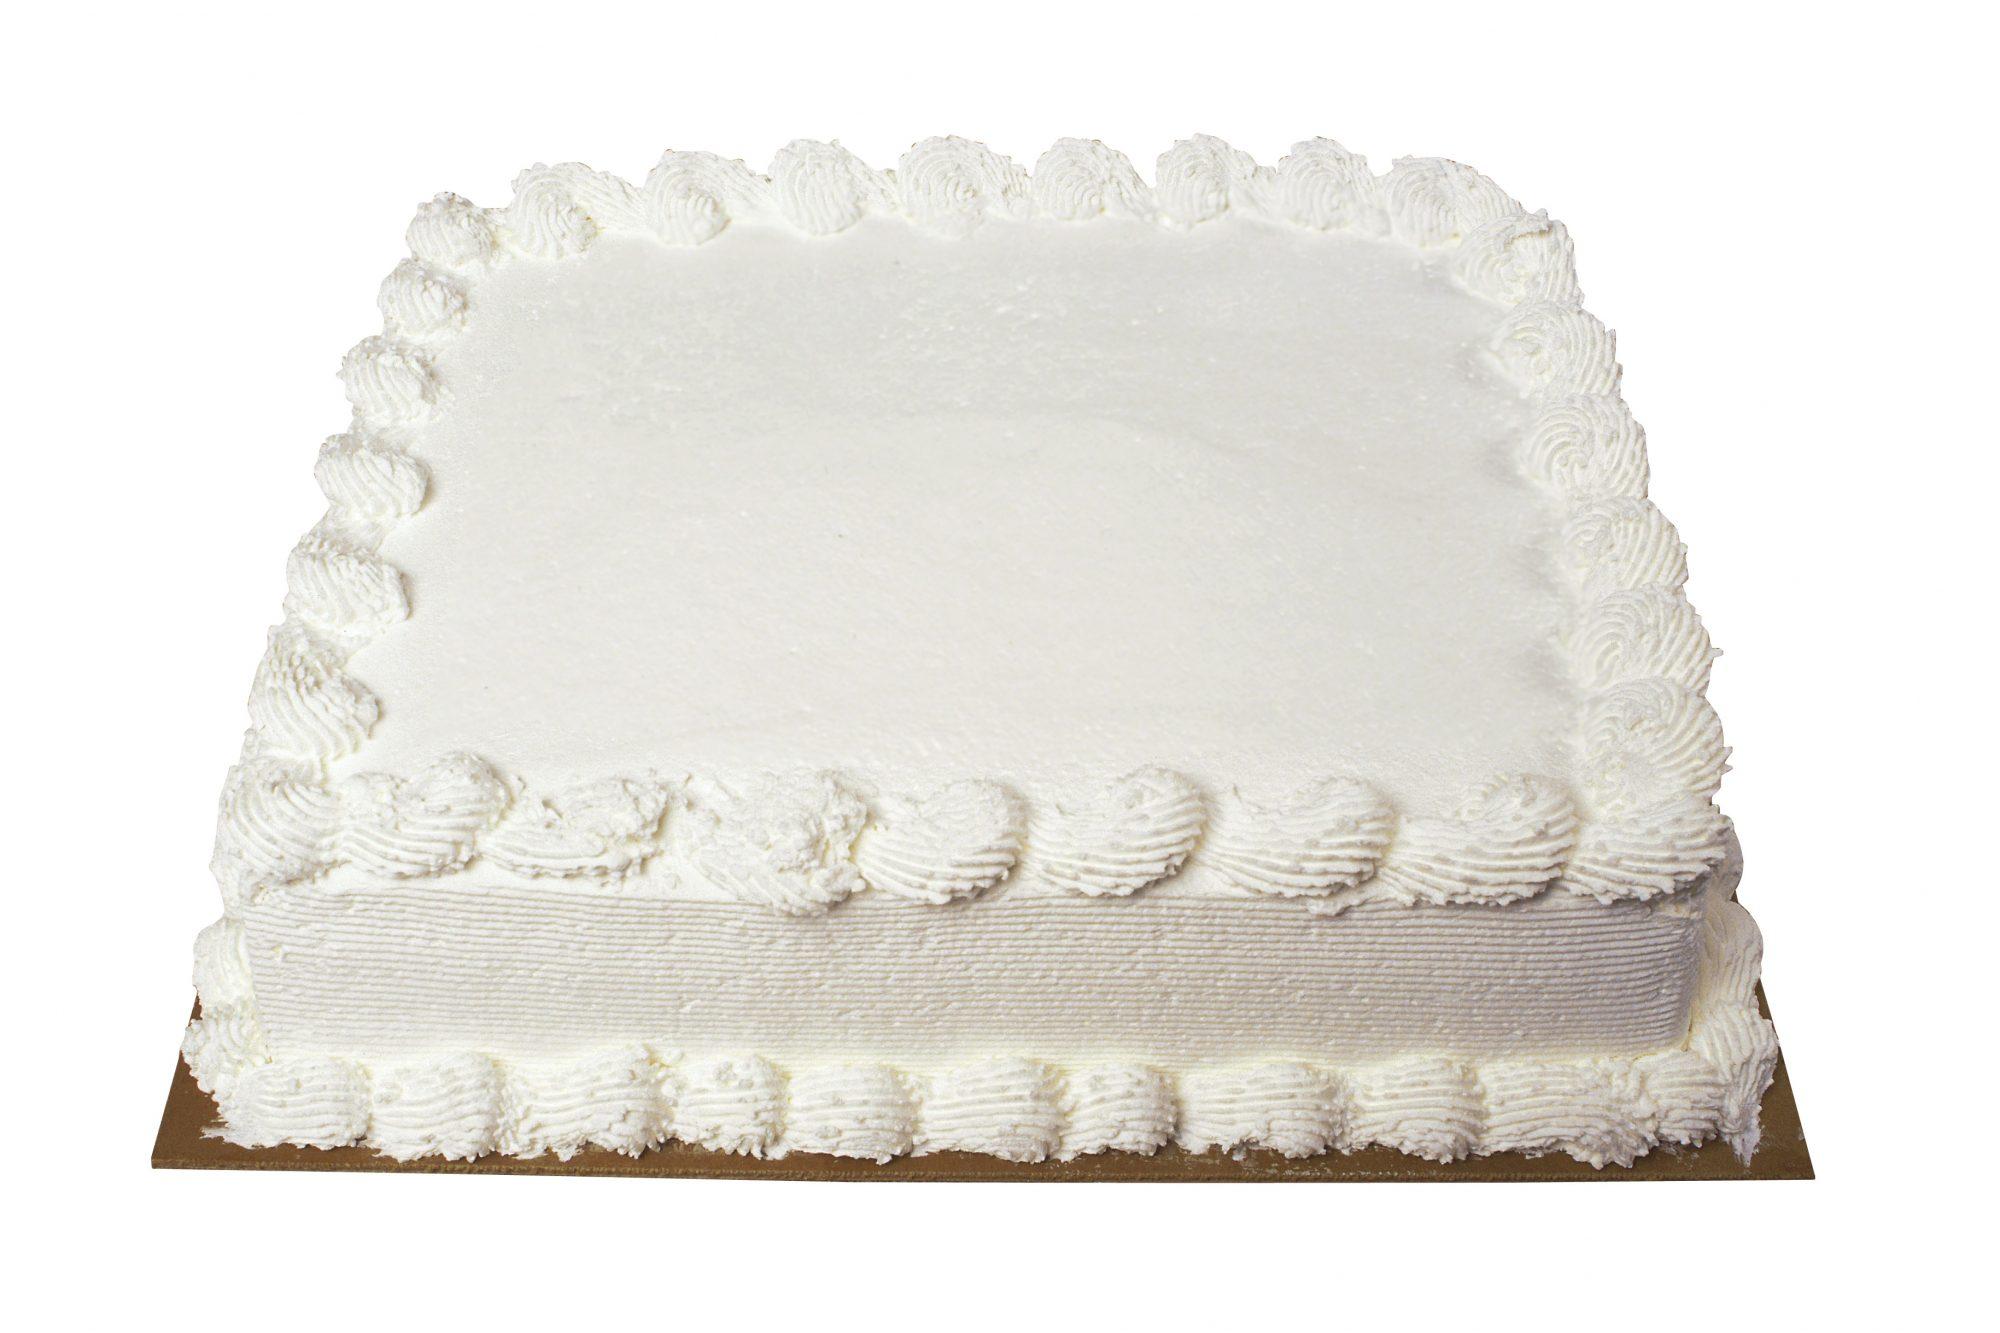 getty-sheet-cake-image